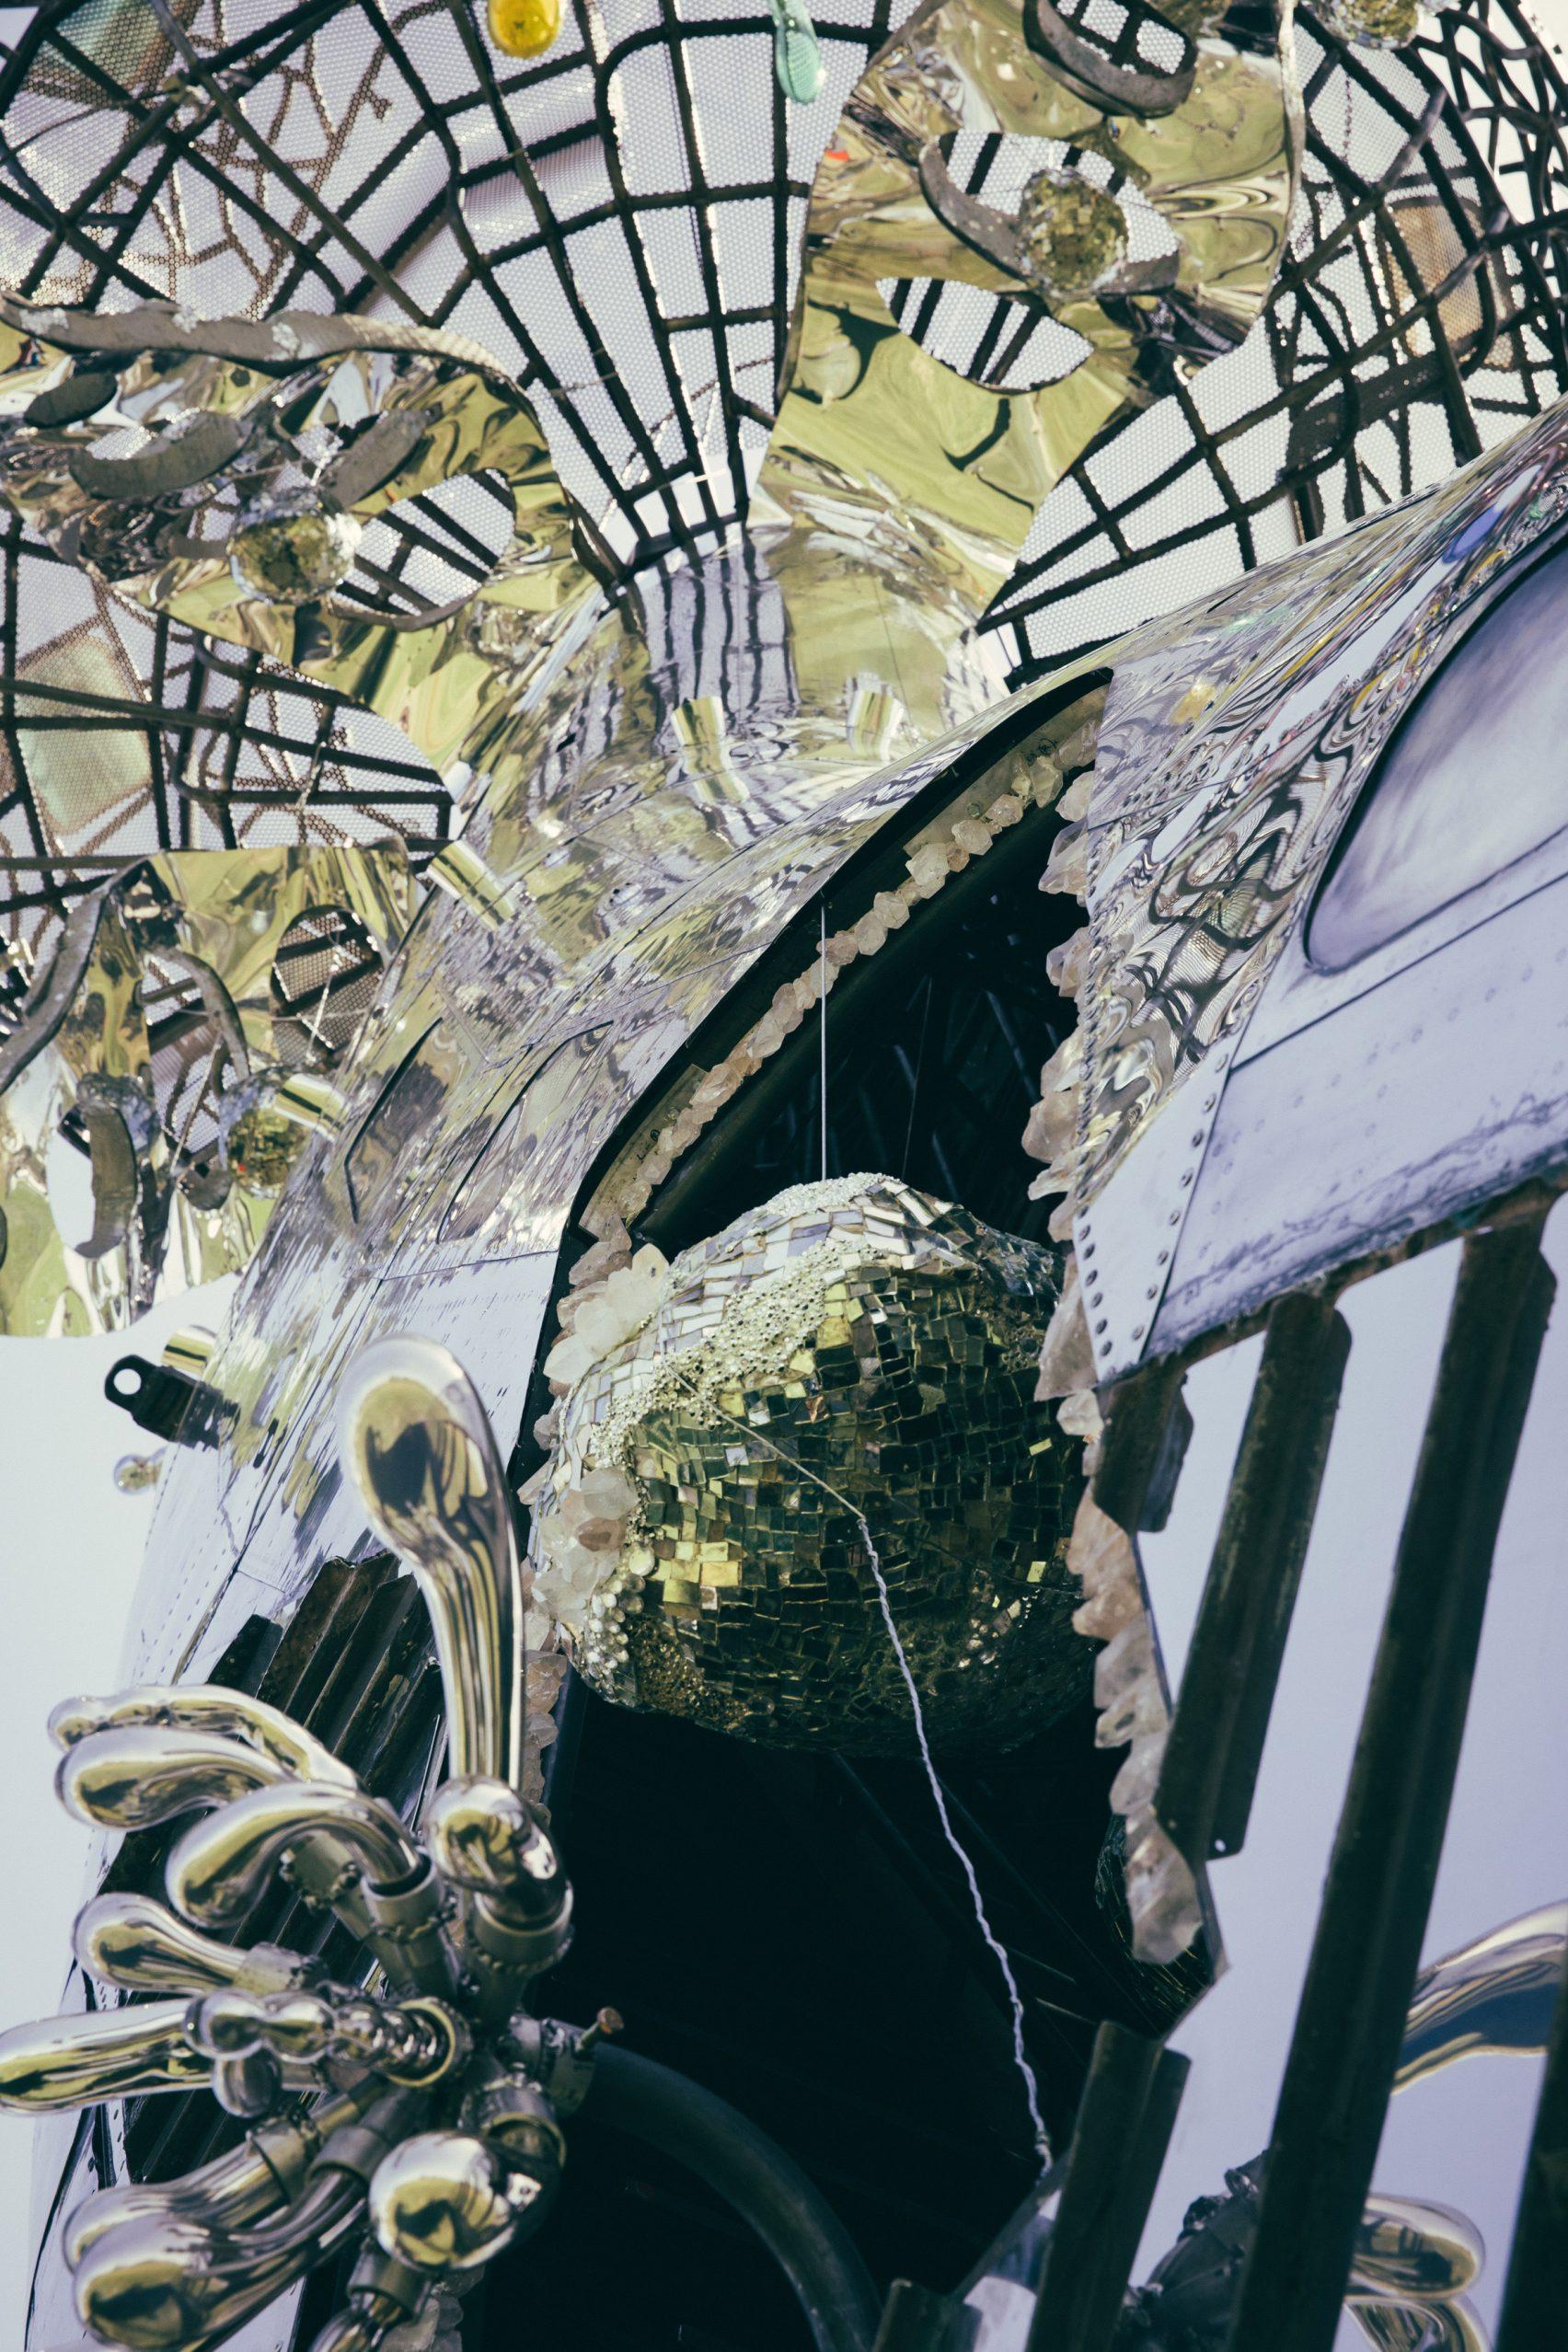 Lodestar by Randy Polumbo